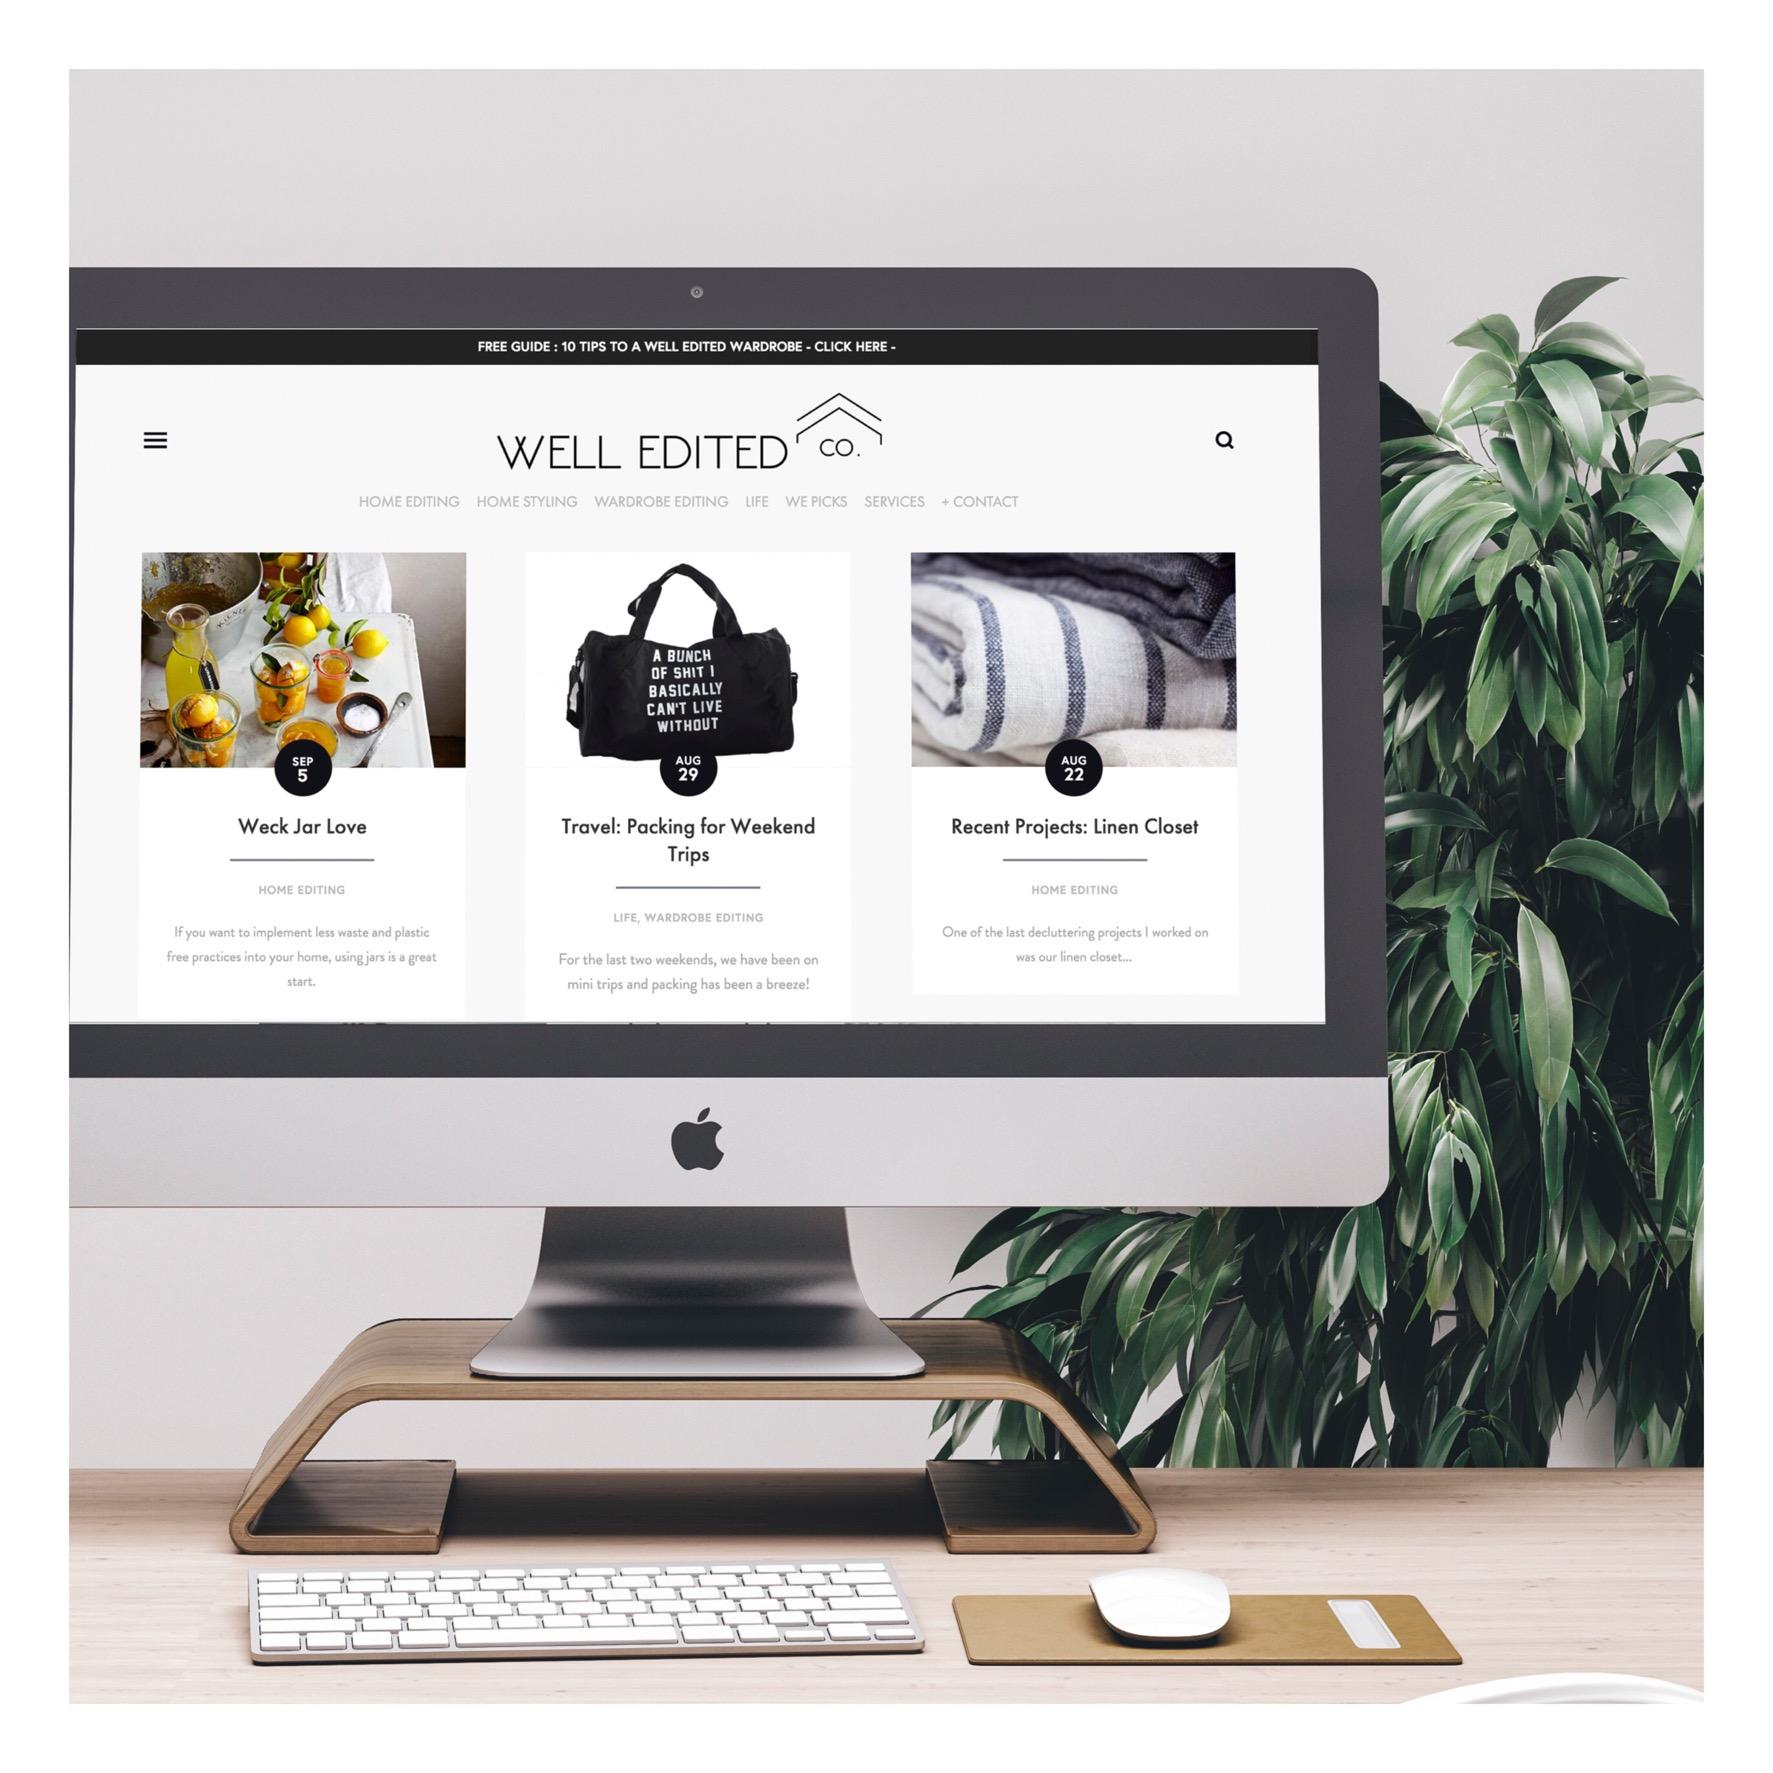 well-edited-co-website-design